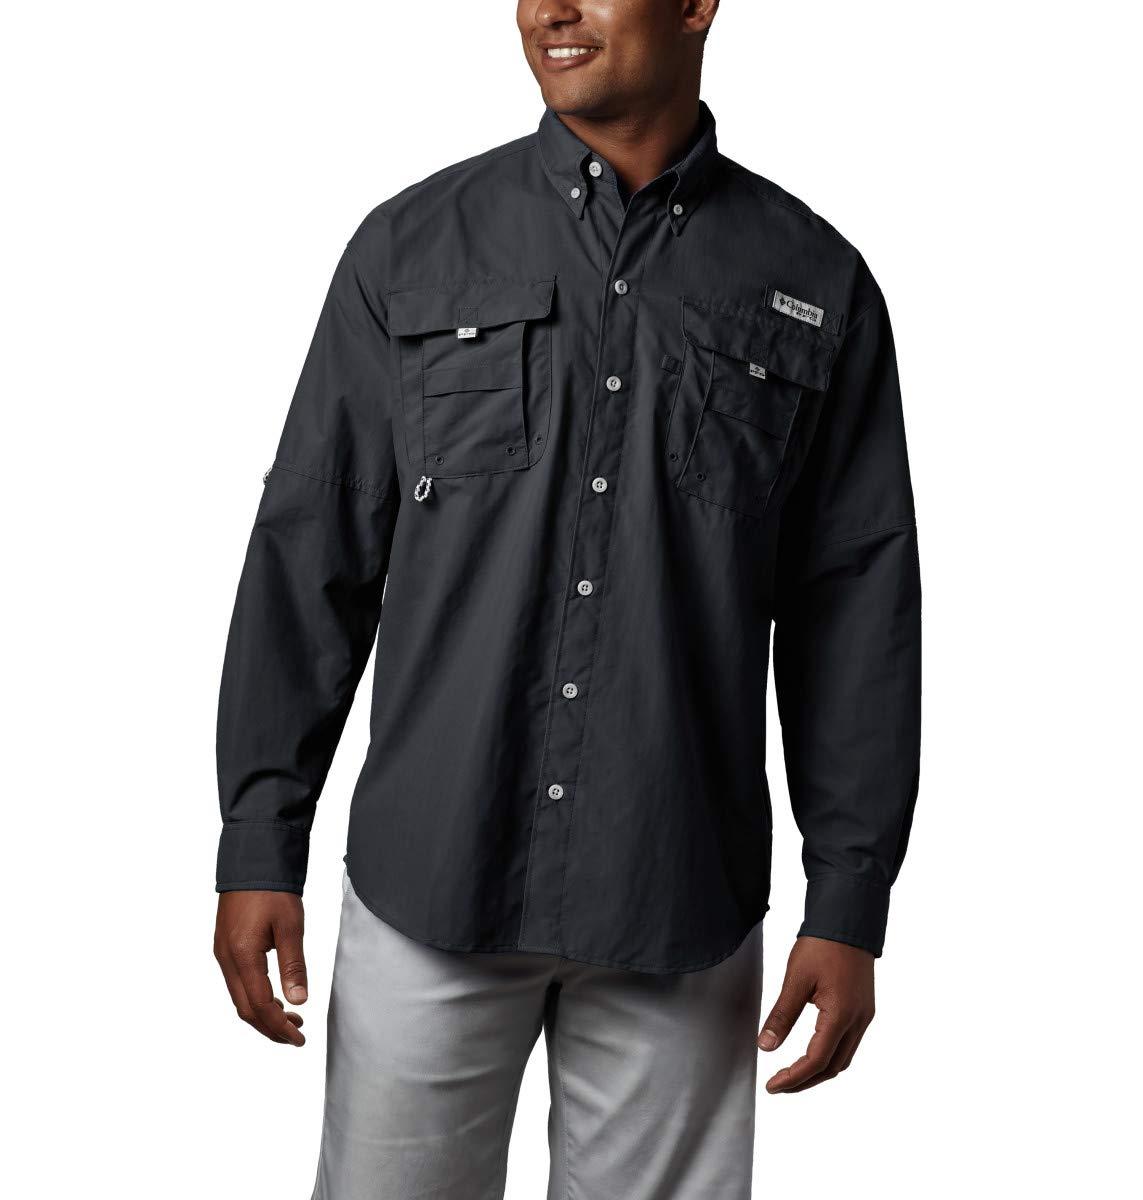 Columbia Men's PFG Bahama II Long Sleeve Shirt , Black, Large